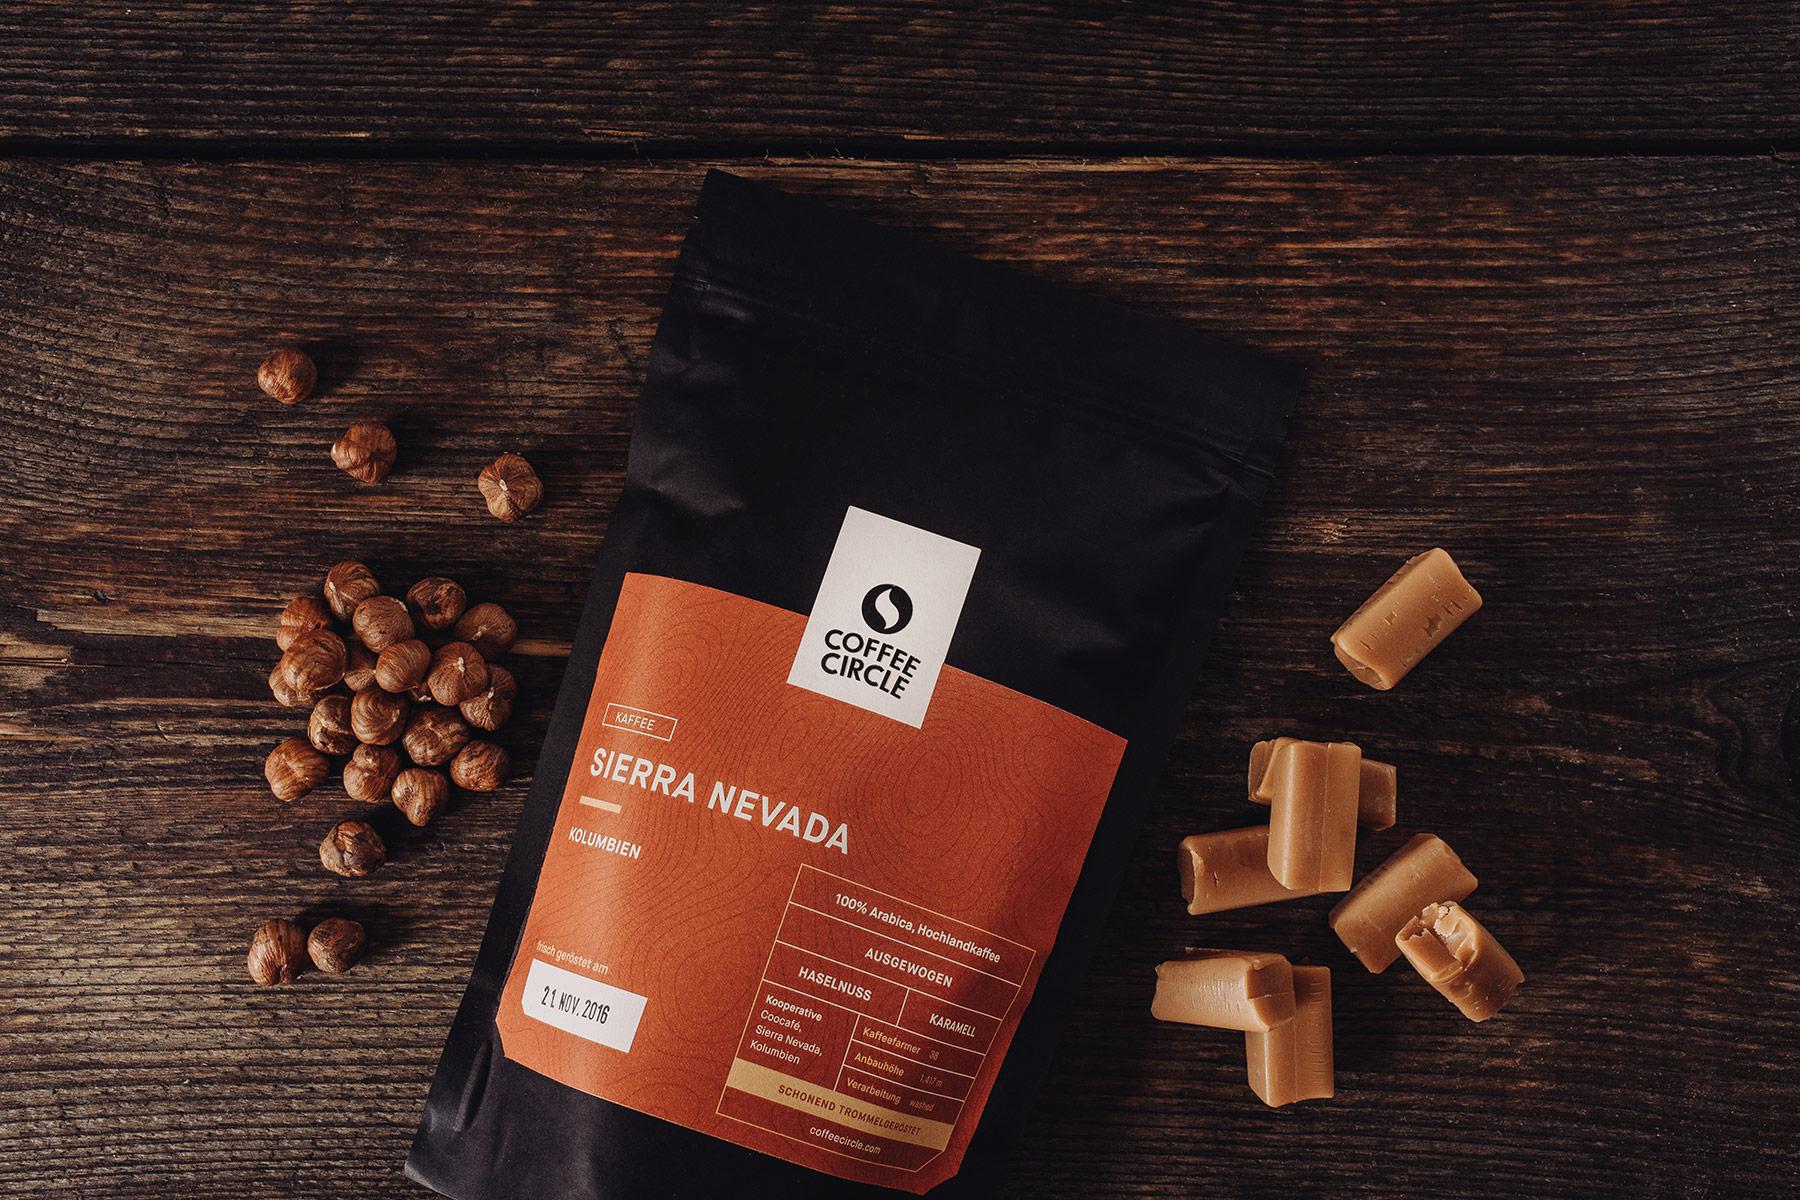 max-duchardt-m-a-a-x-coffeecircle-packaging-design-sierra-nevada-geschmack